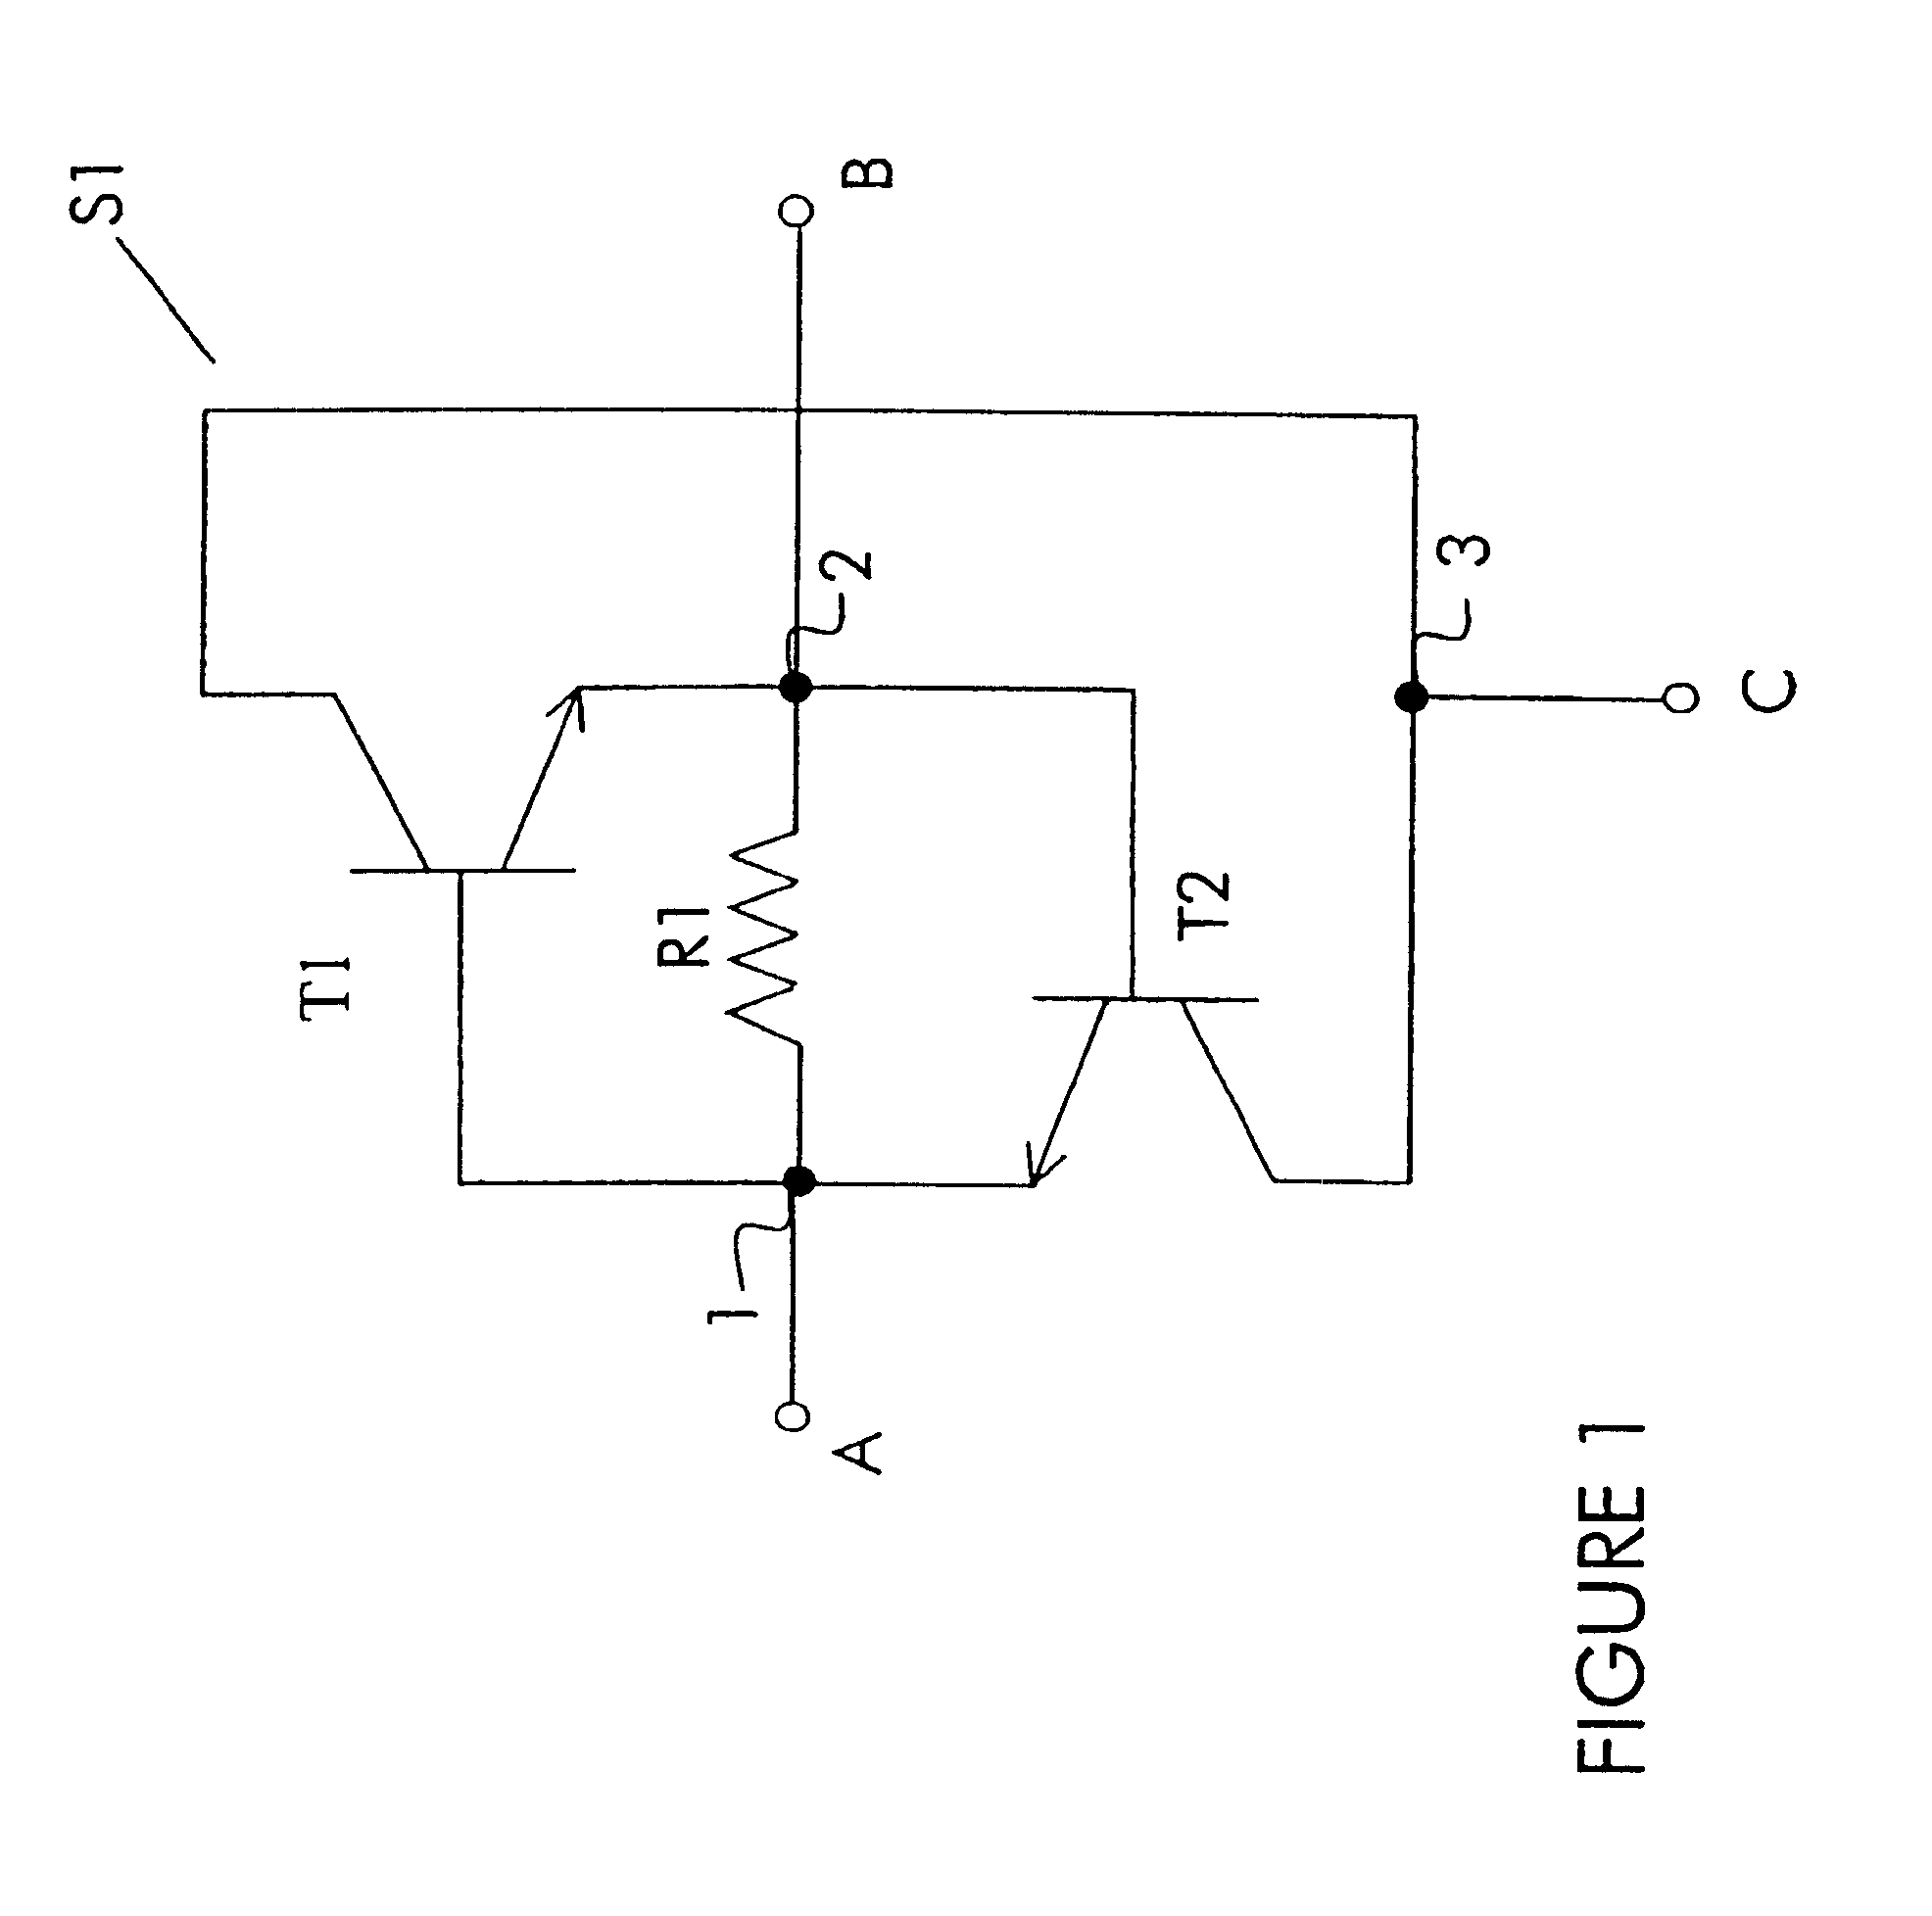 Brevet Us6680641 Bidirectional Bipolar Transistor Switch